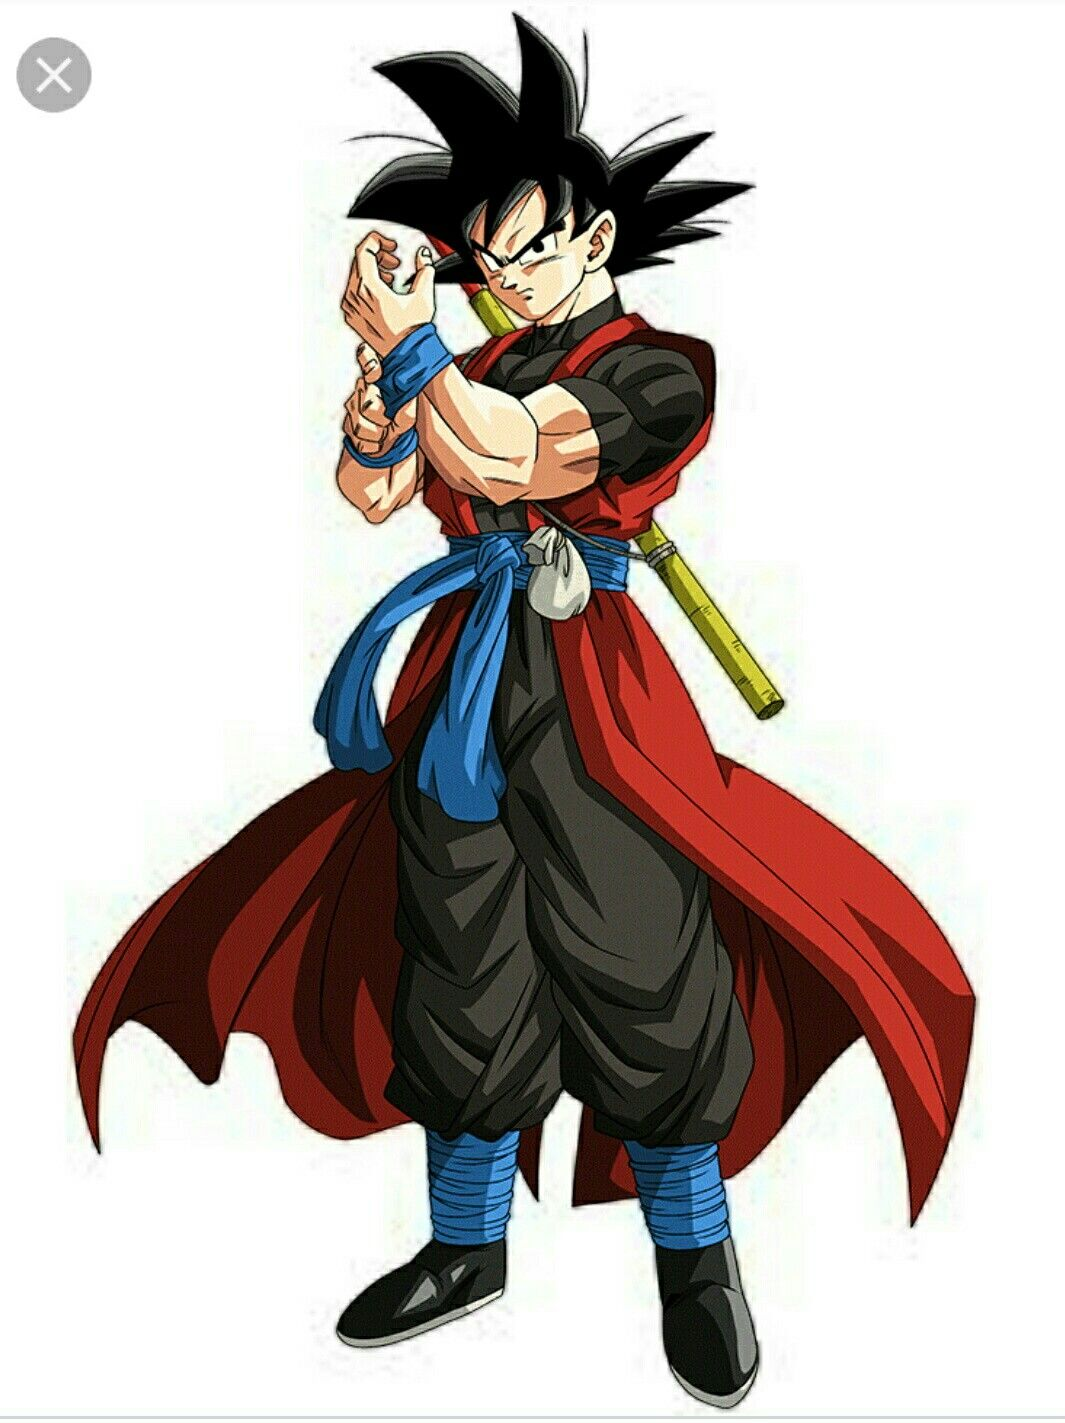 Xeno Goku Base Sdbh World Mission Power Level 27 Quadrillion Dragon Ball Super Goku Anime Dragon Ball Super Dragon Ball Super Manga